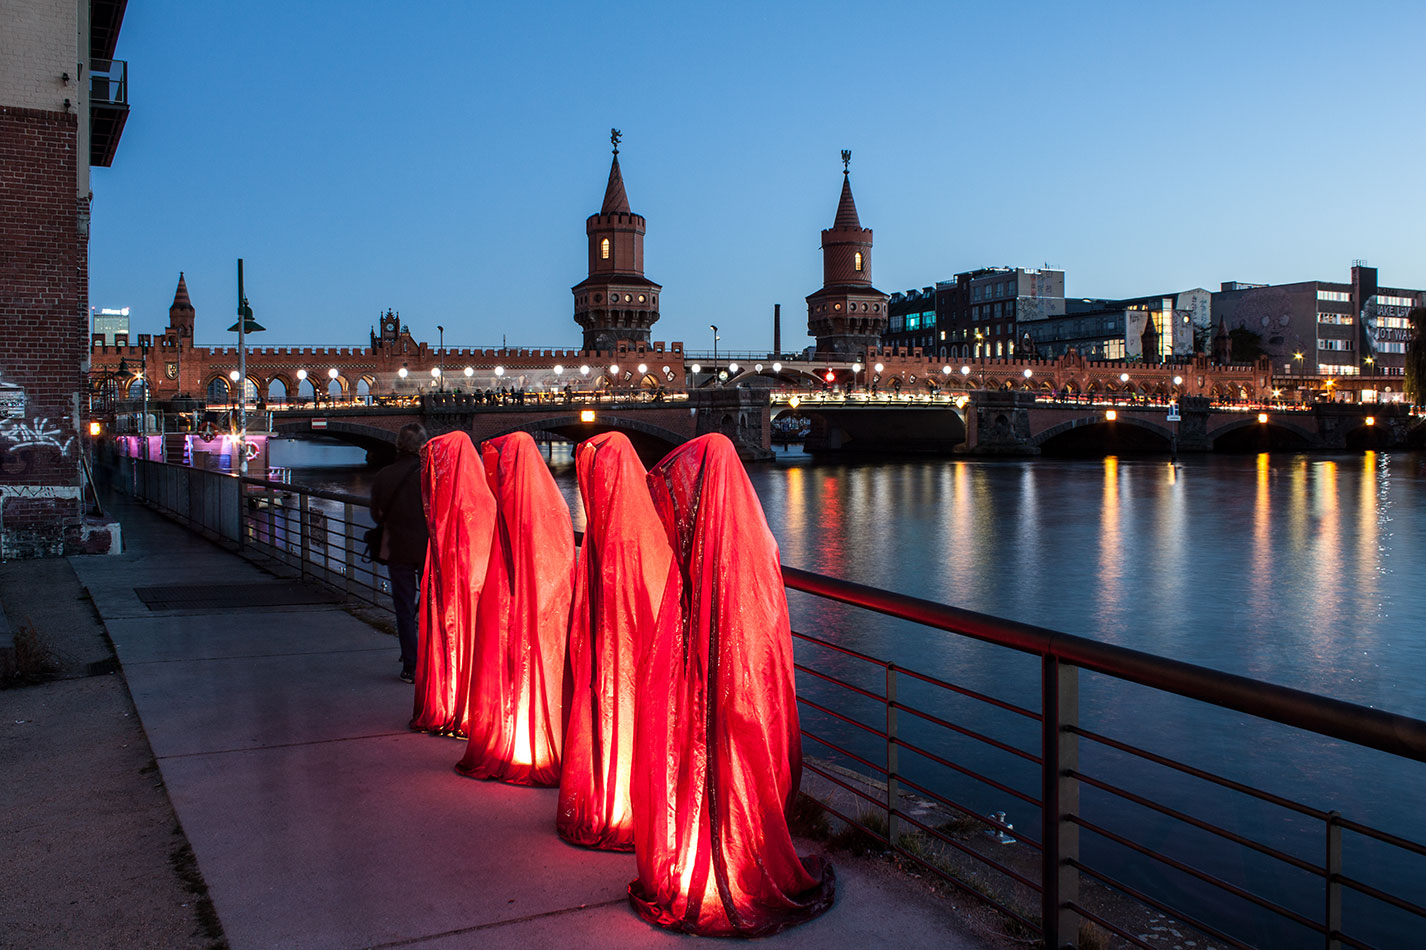 25-years-wallfall-berlin-germany-east-side-gallery-contemporary-fine-art-show-arts-design-guardians-of-time-manfred-kili-kielnhofer-4463